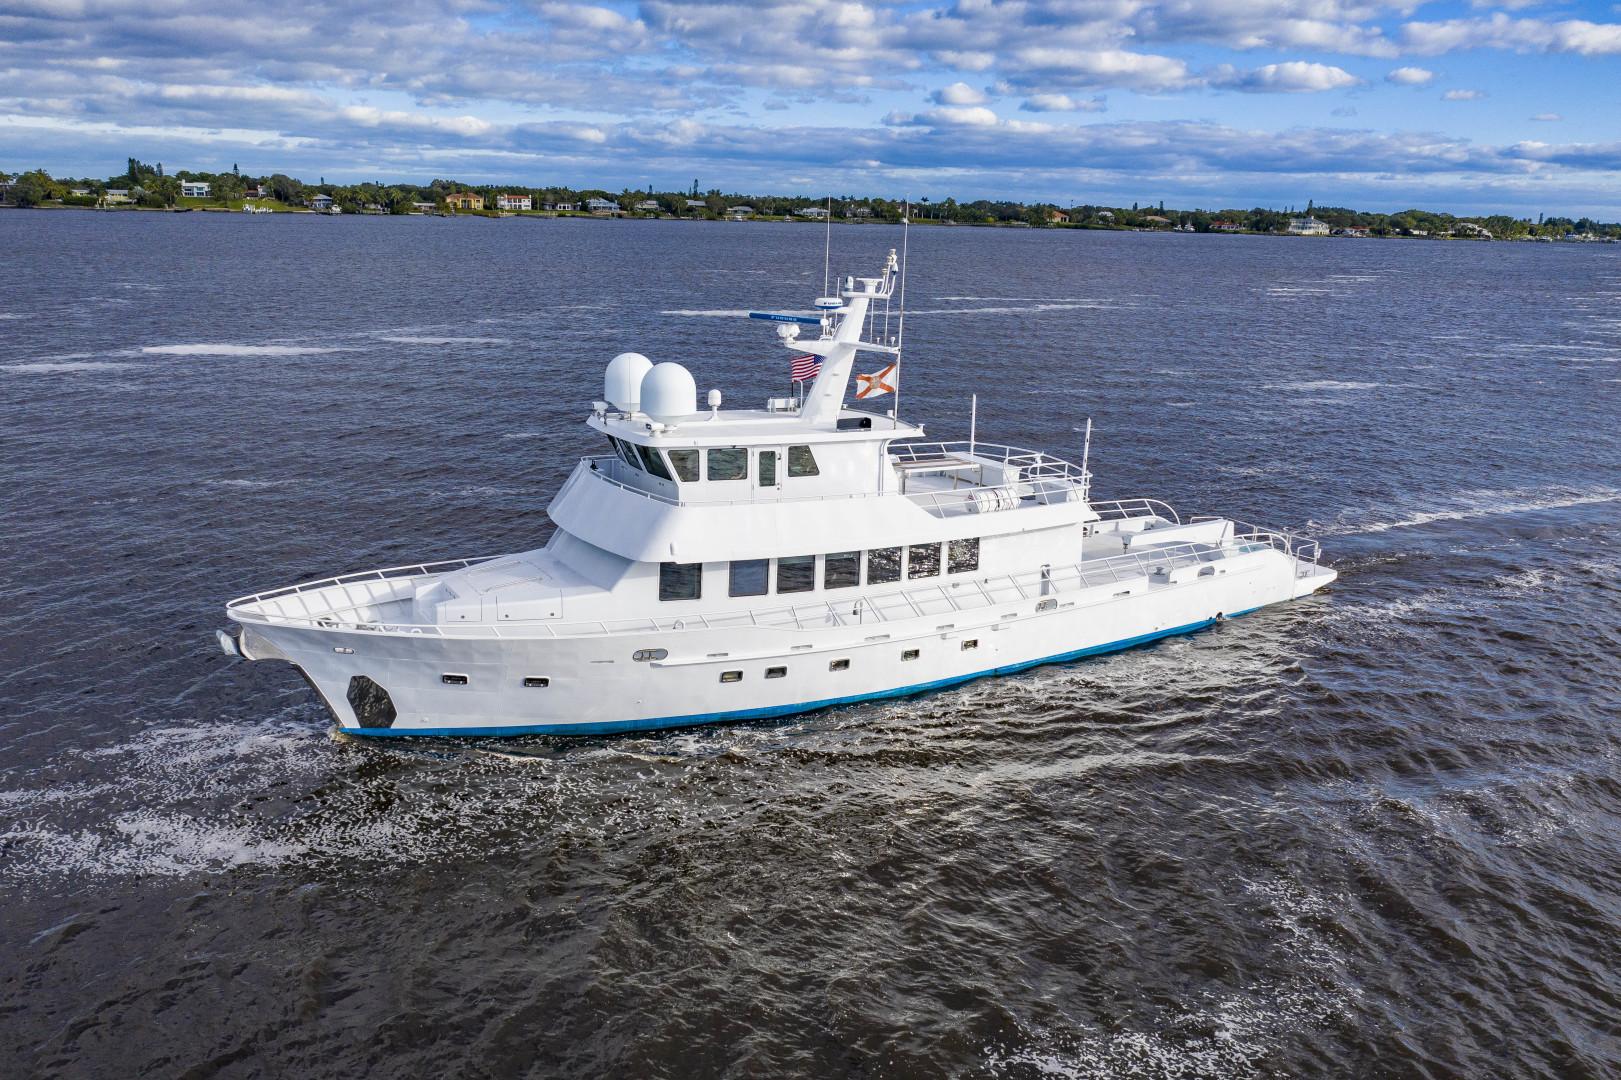 GlassTech-Expedition Yacht 2018-Reset Stuart-Florida-United States-Profile-1568524 | Thumbnail